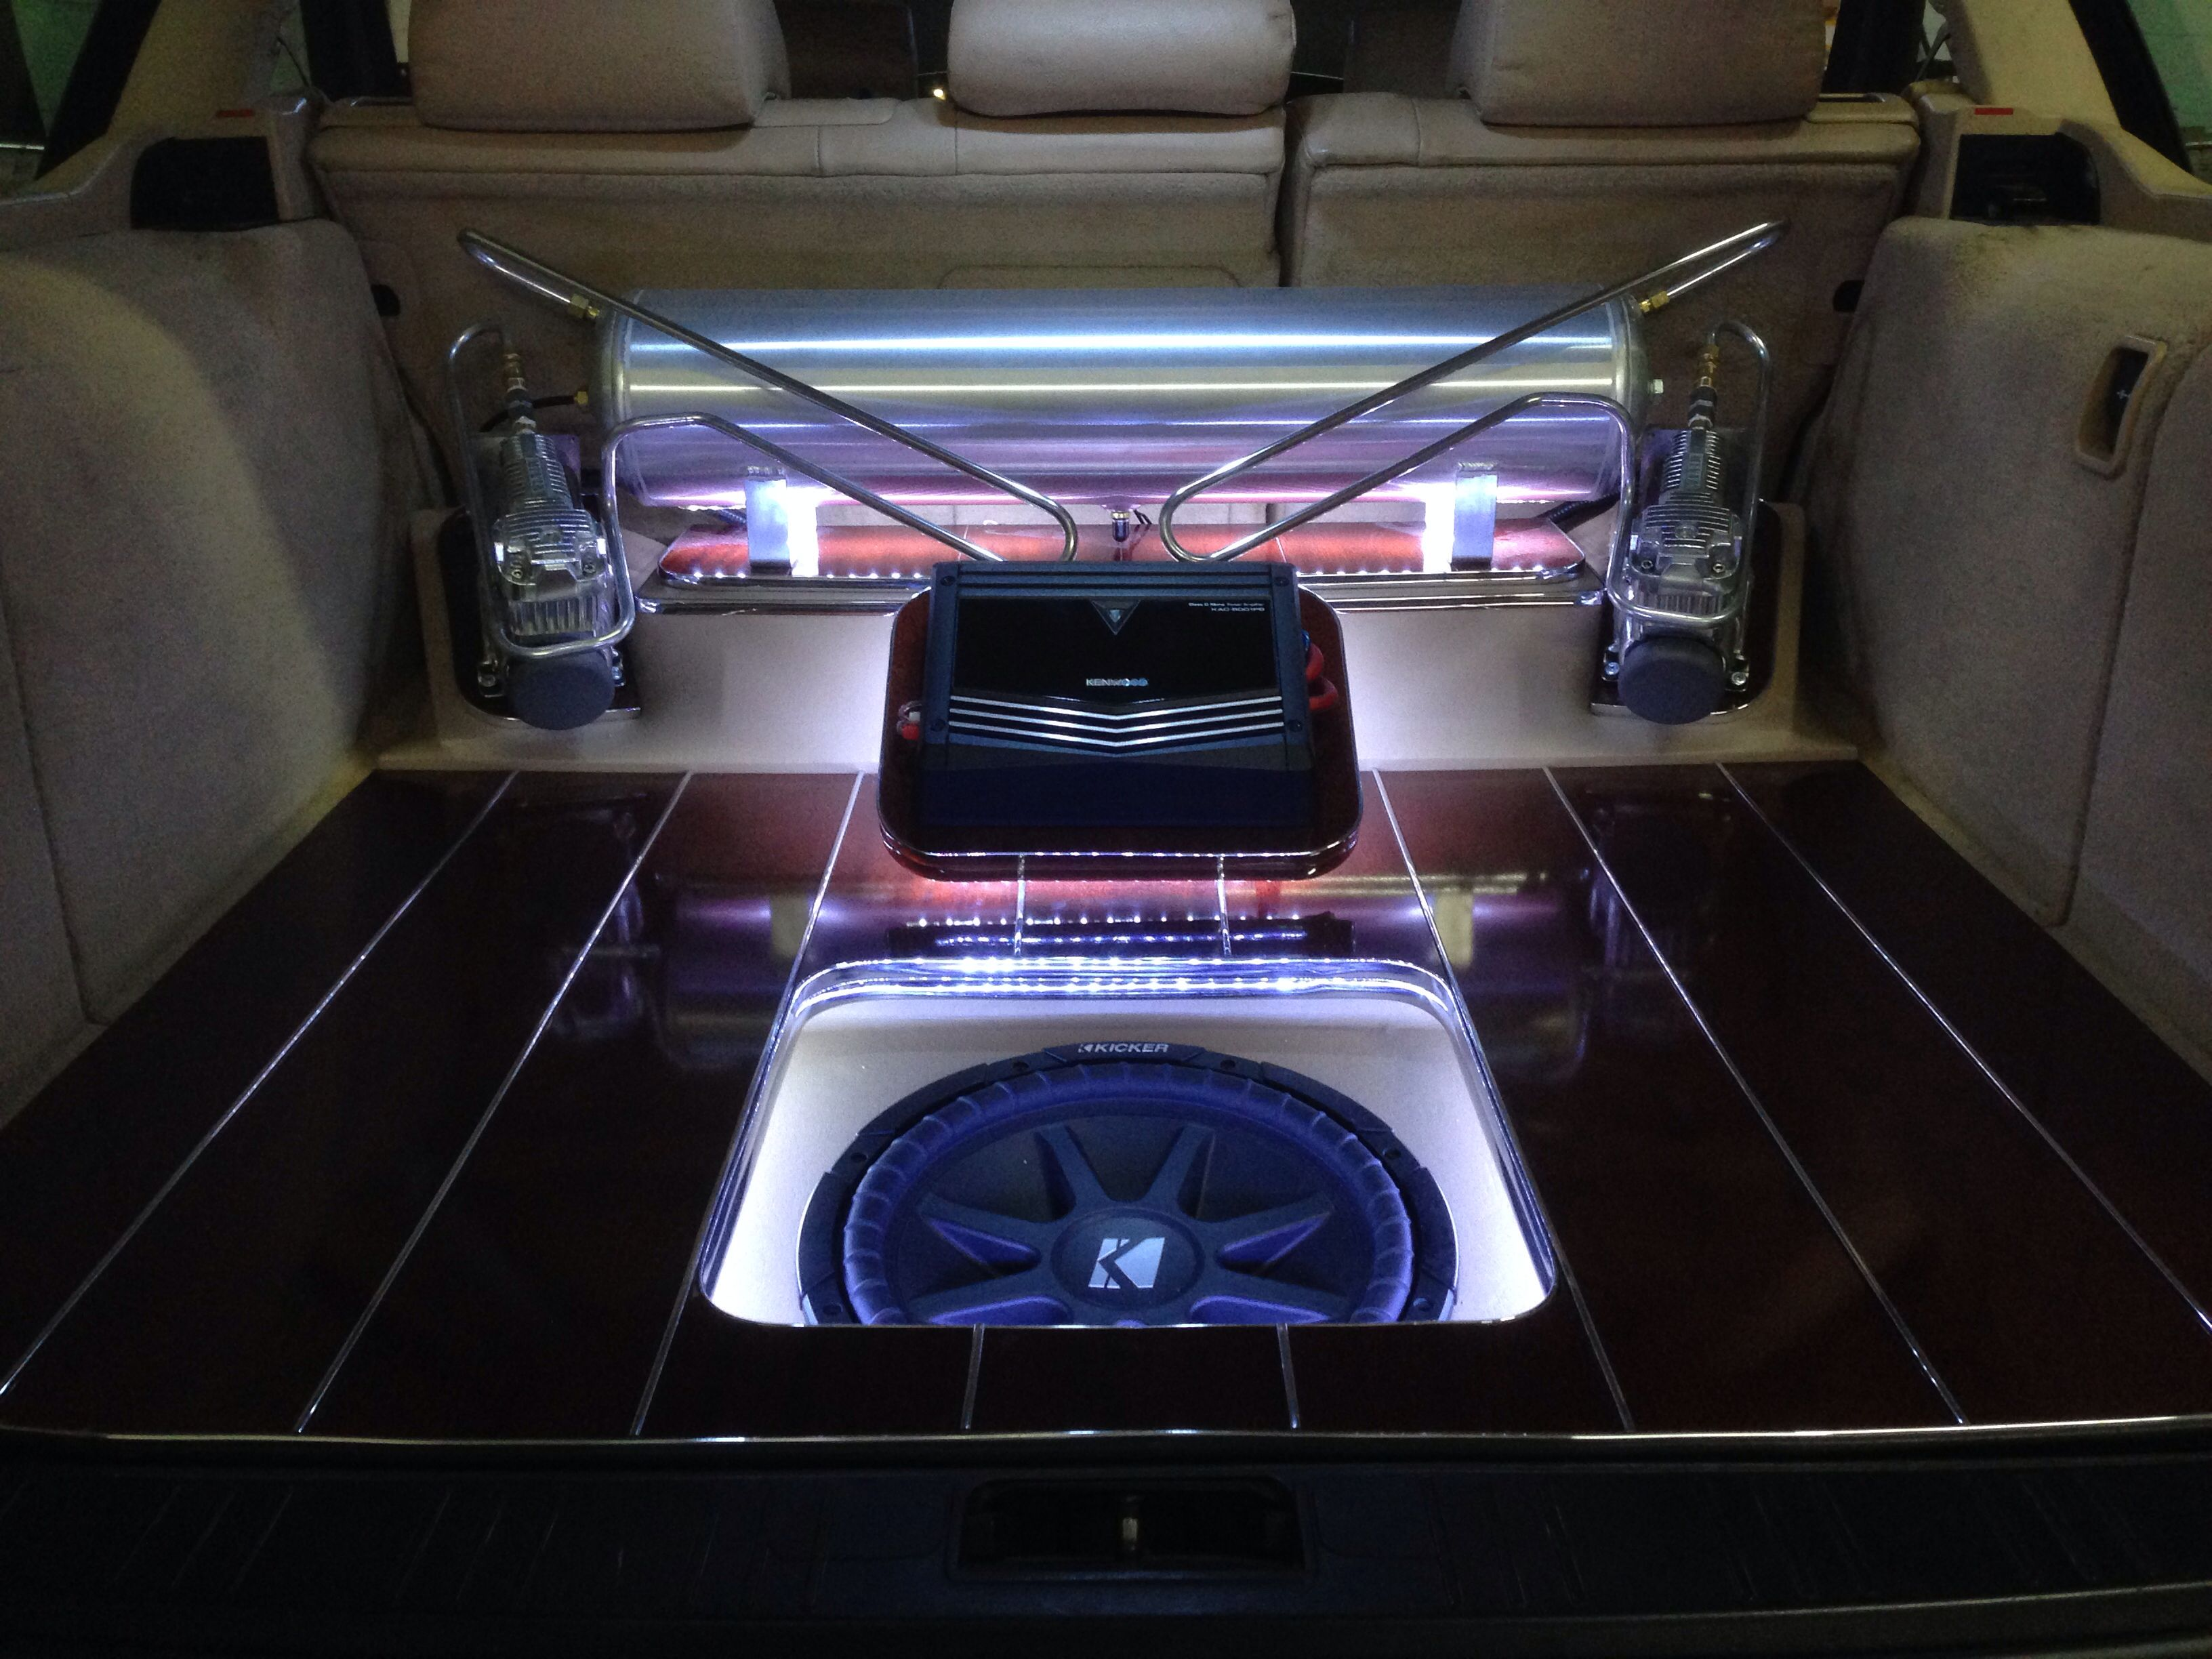 Custom airride setup with custom wood flooring and sound